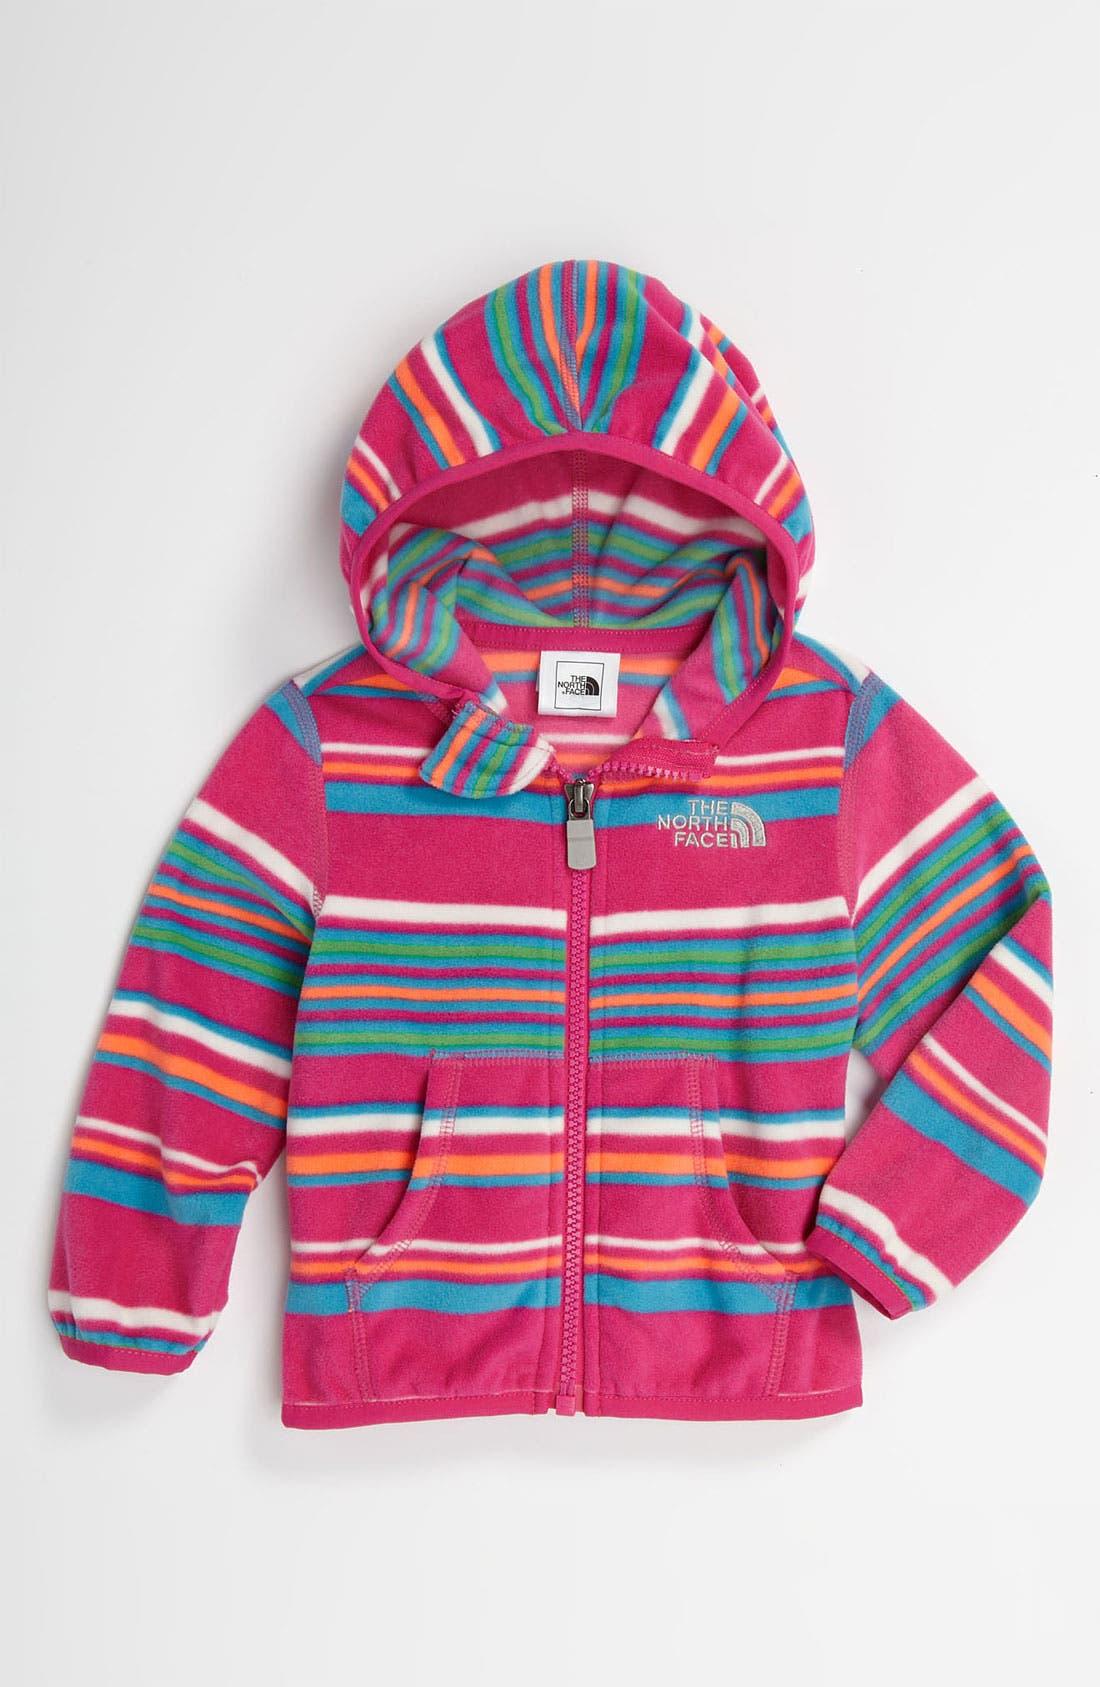 Alternate Image 1 Selected - The North Face 'Glacier' Fleece Jacket (Baby)